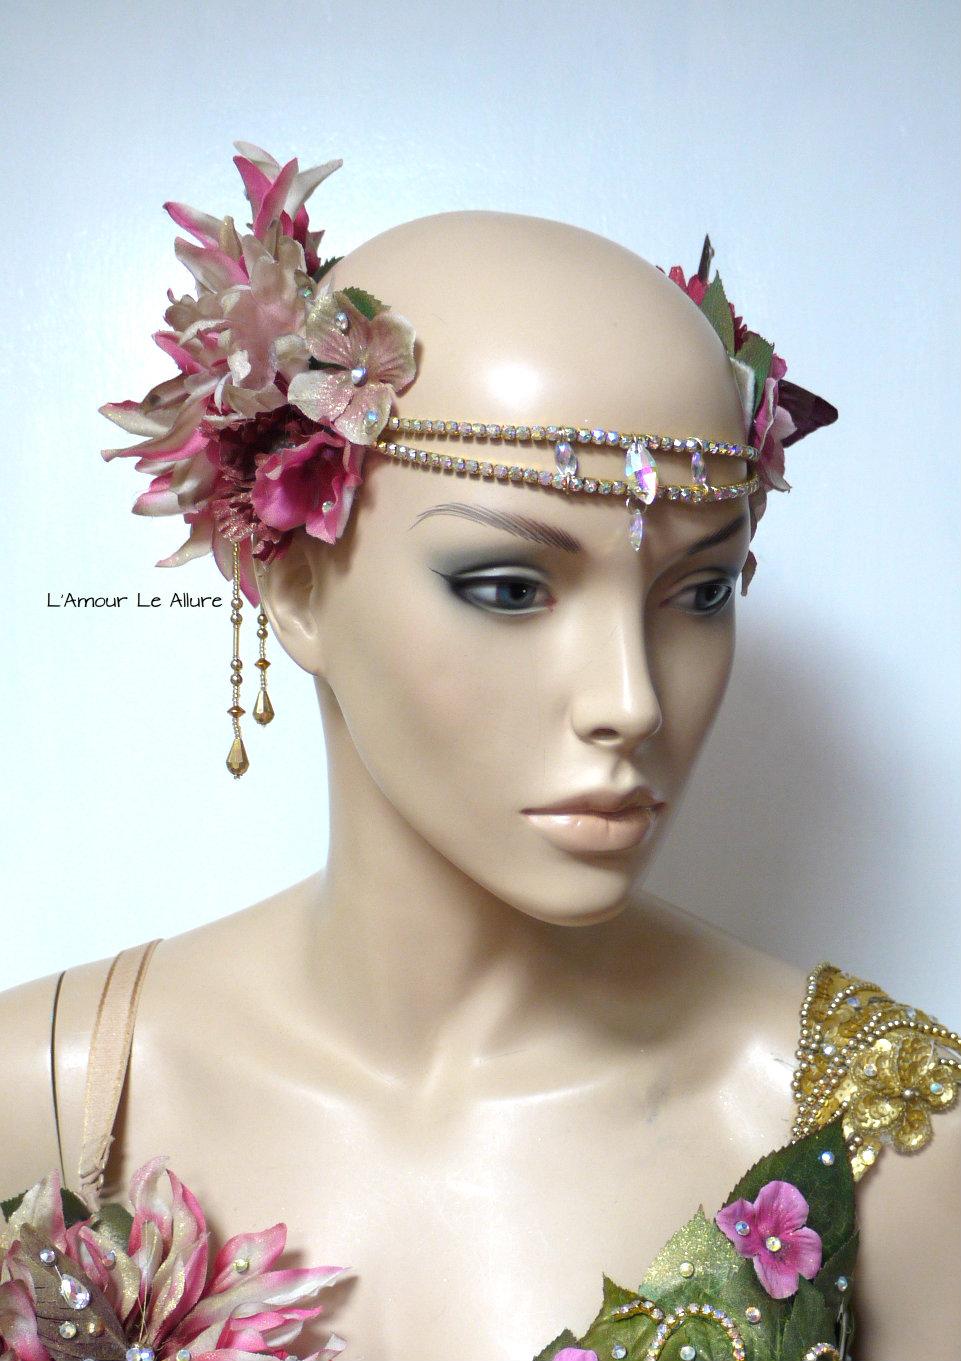 golden spring fairy goddess flower crown halloween costume headband headpiece rave